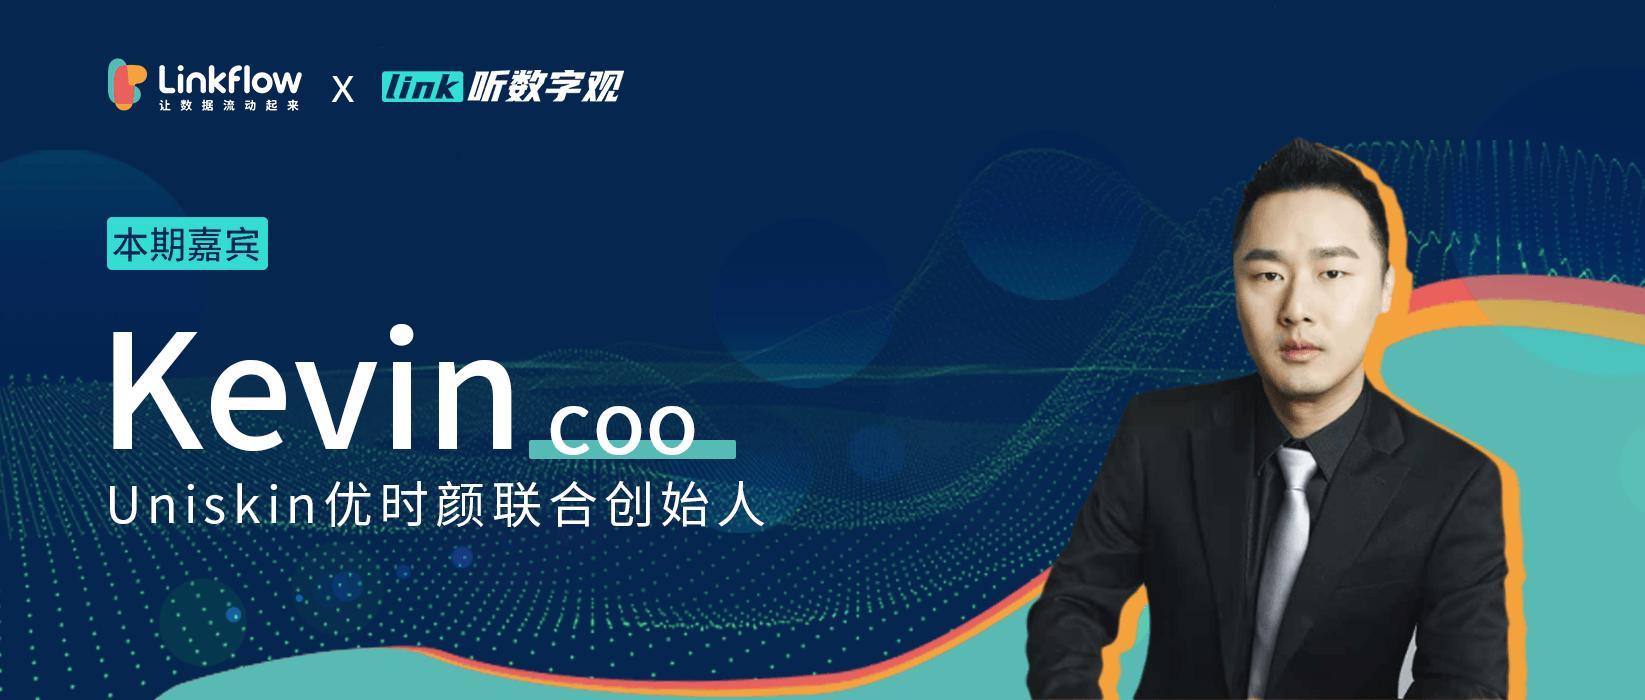 UNISKIN COO Kevin|营销数字化:数据沉淀和数据系统化运营一定要趁早!